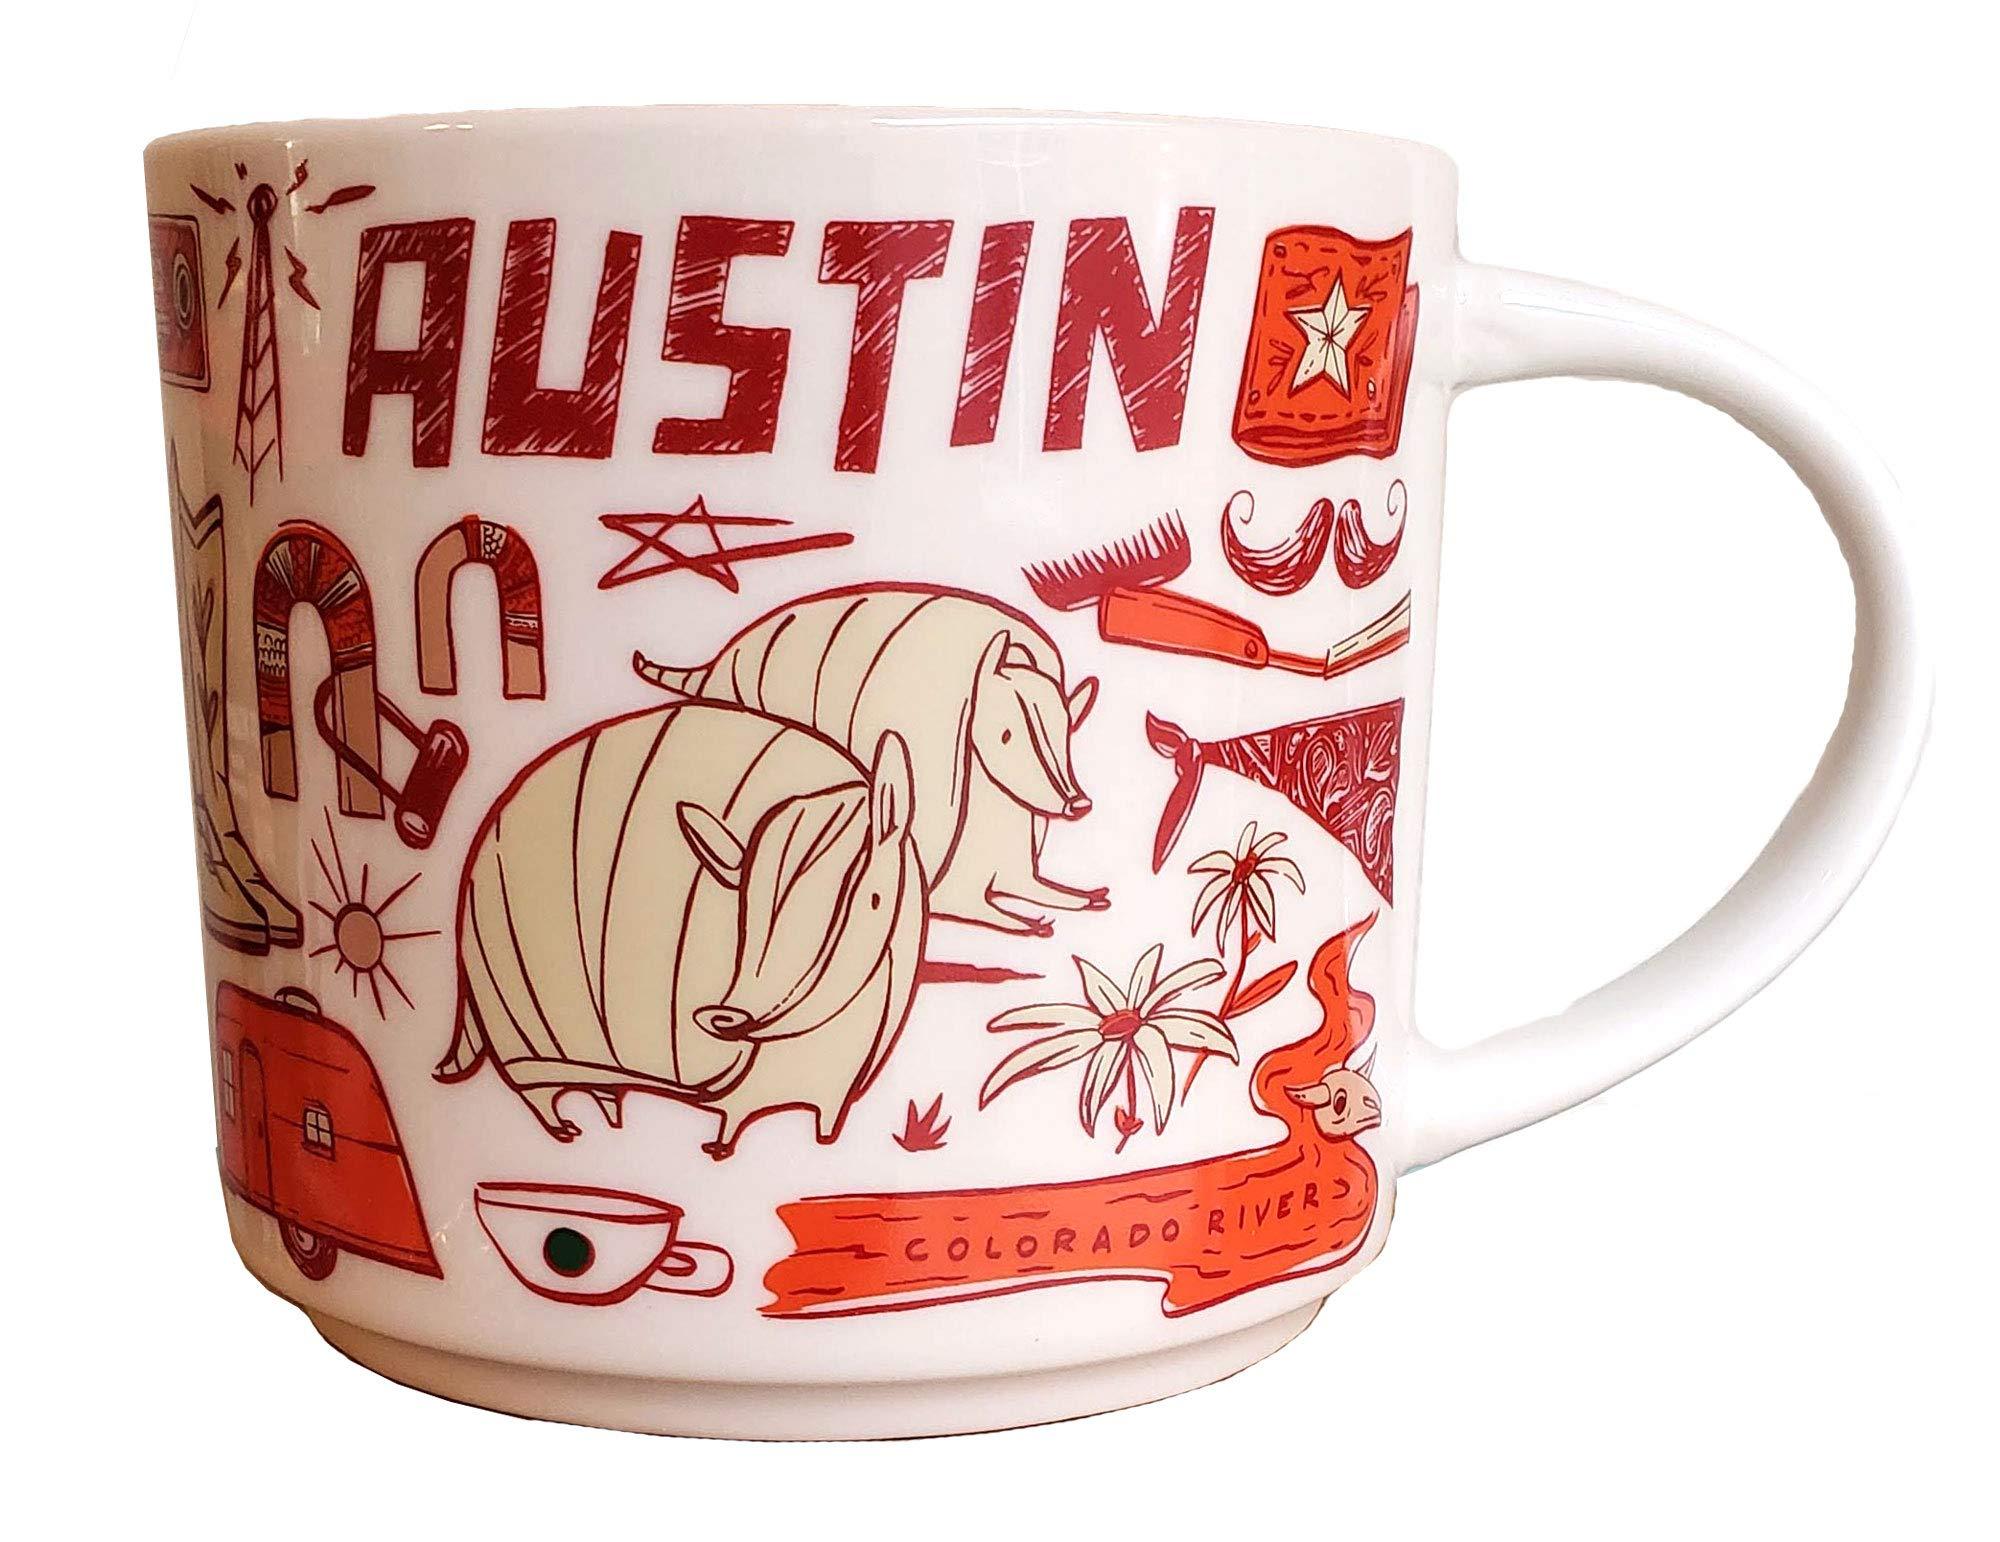 Starbucks Austin Coffee Mug - Been There Series